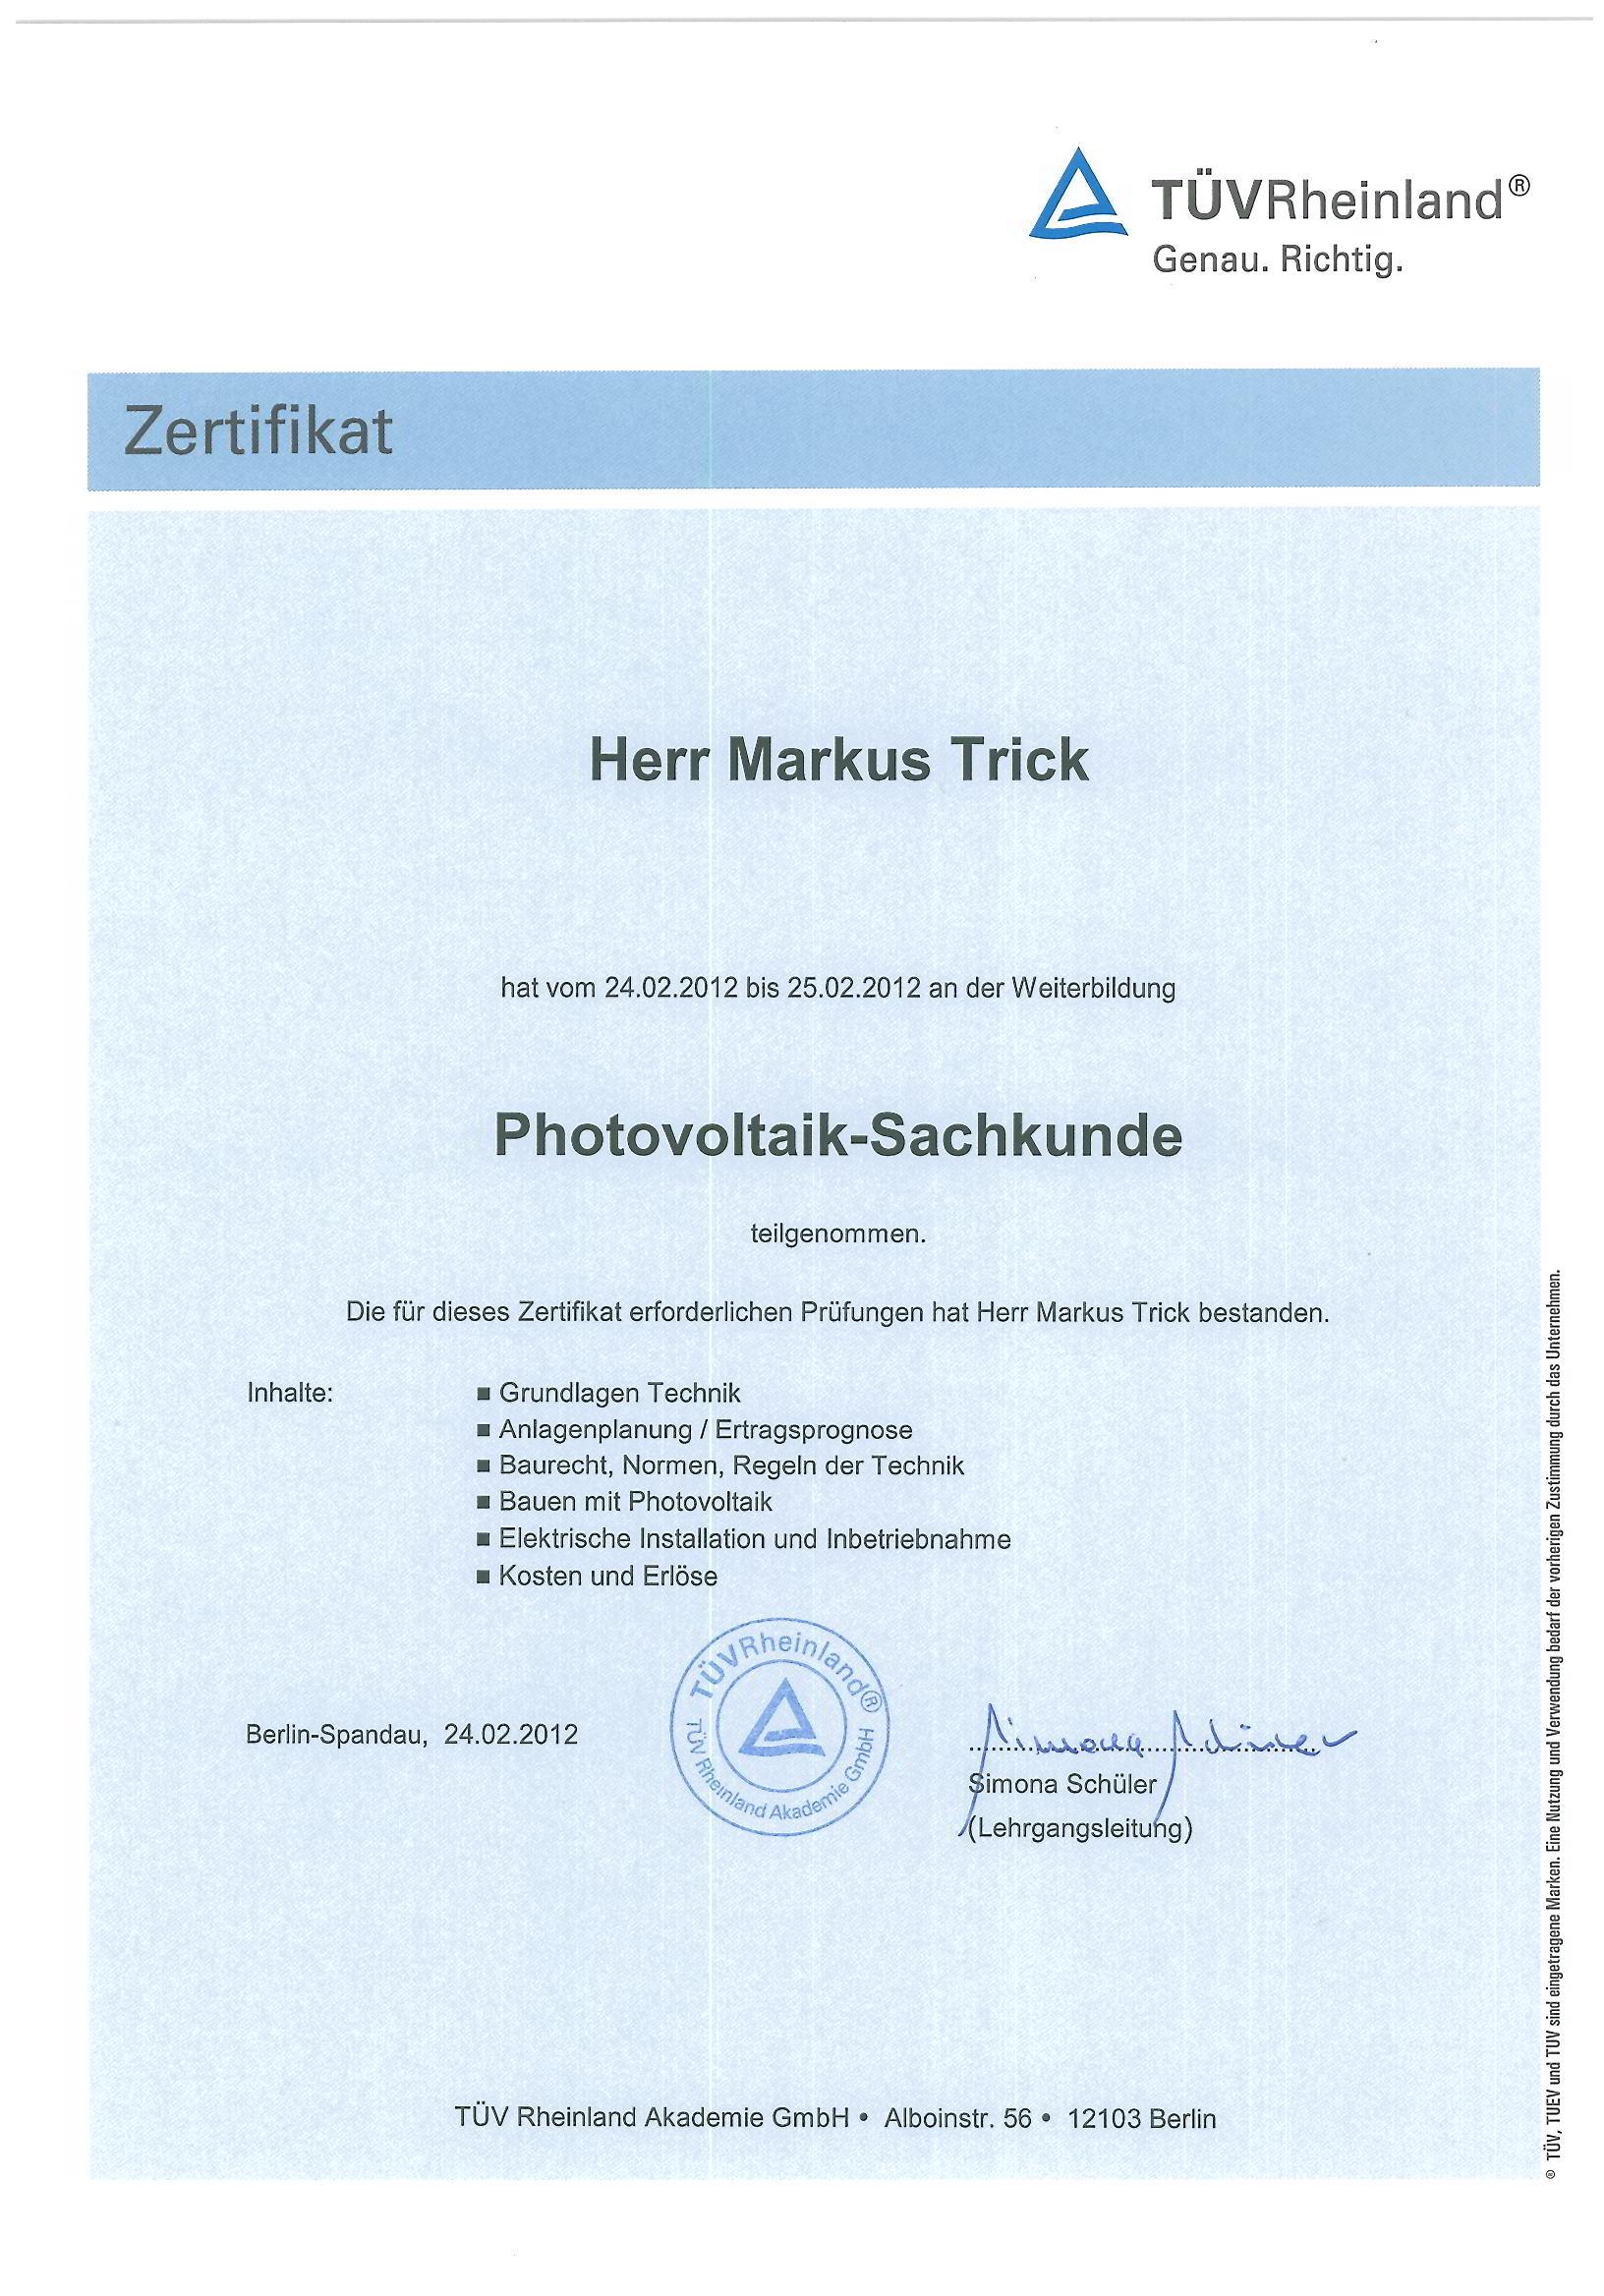 Zertifikat - TÜV-geprüfter Photovoltaiksachkundiger - Markus Trick